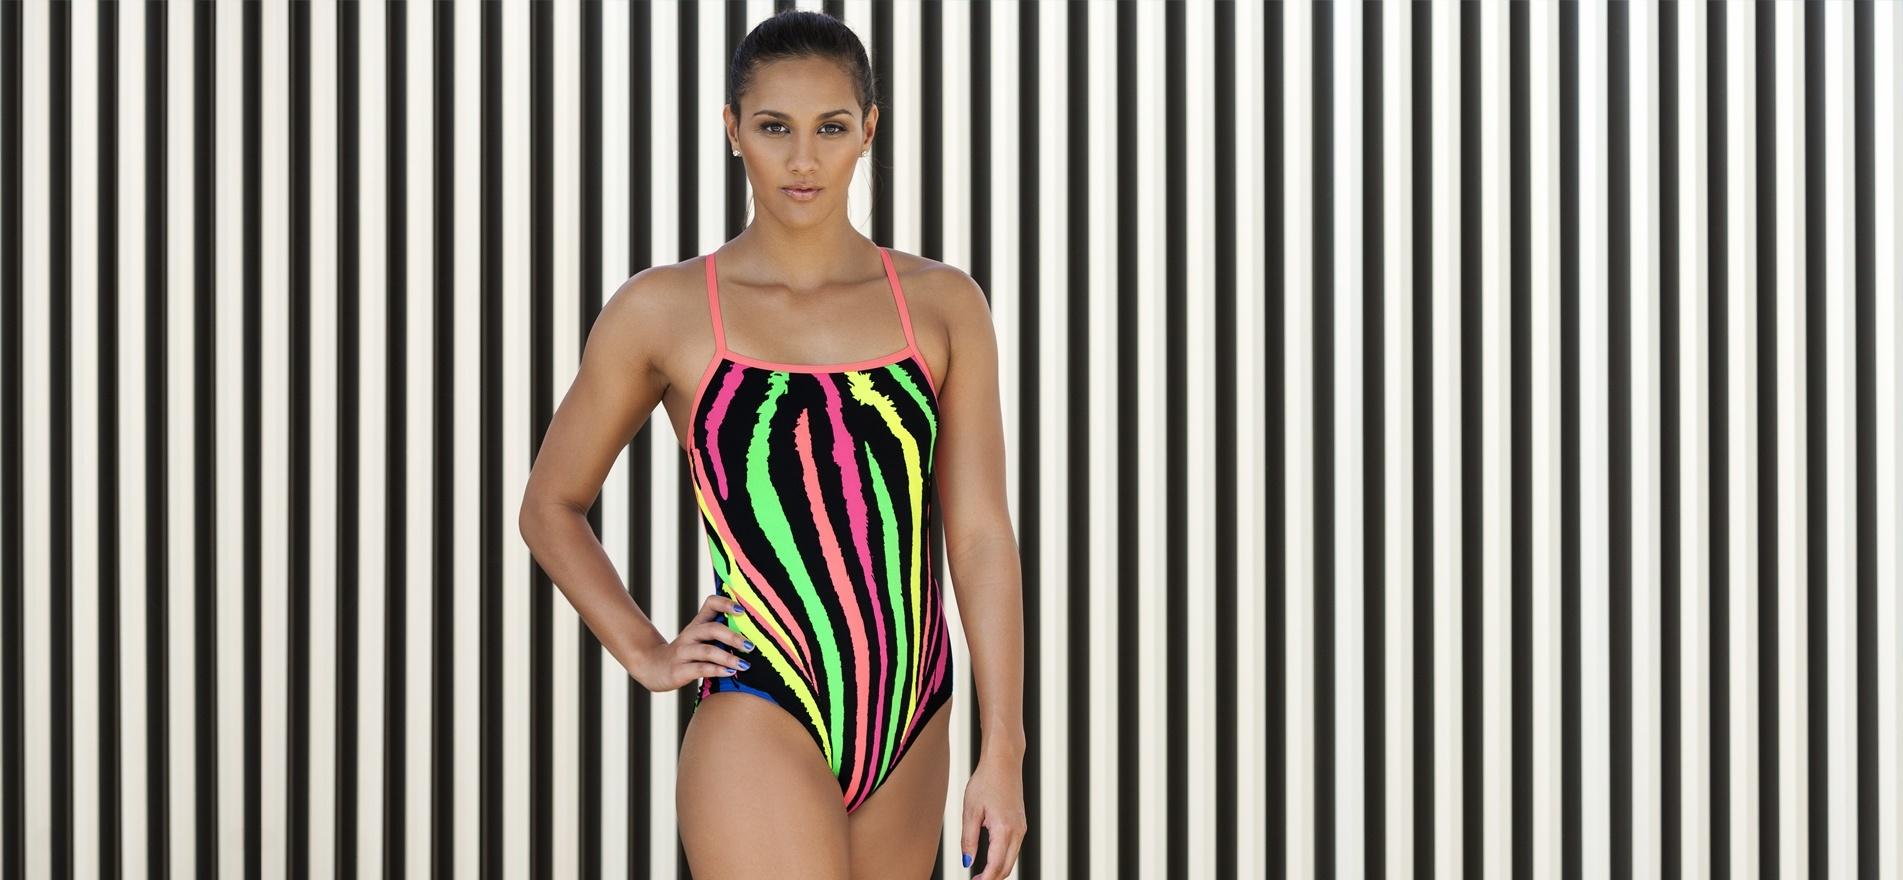 0160b059f77 Funkita Giveaway! Pick Your Favorite Print, Win With The New Funkita  Swimwear Launch